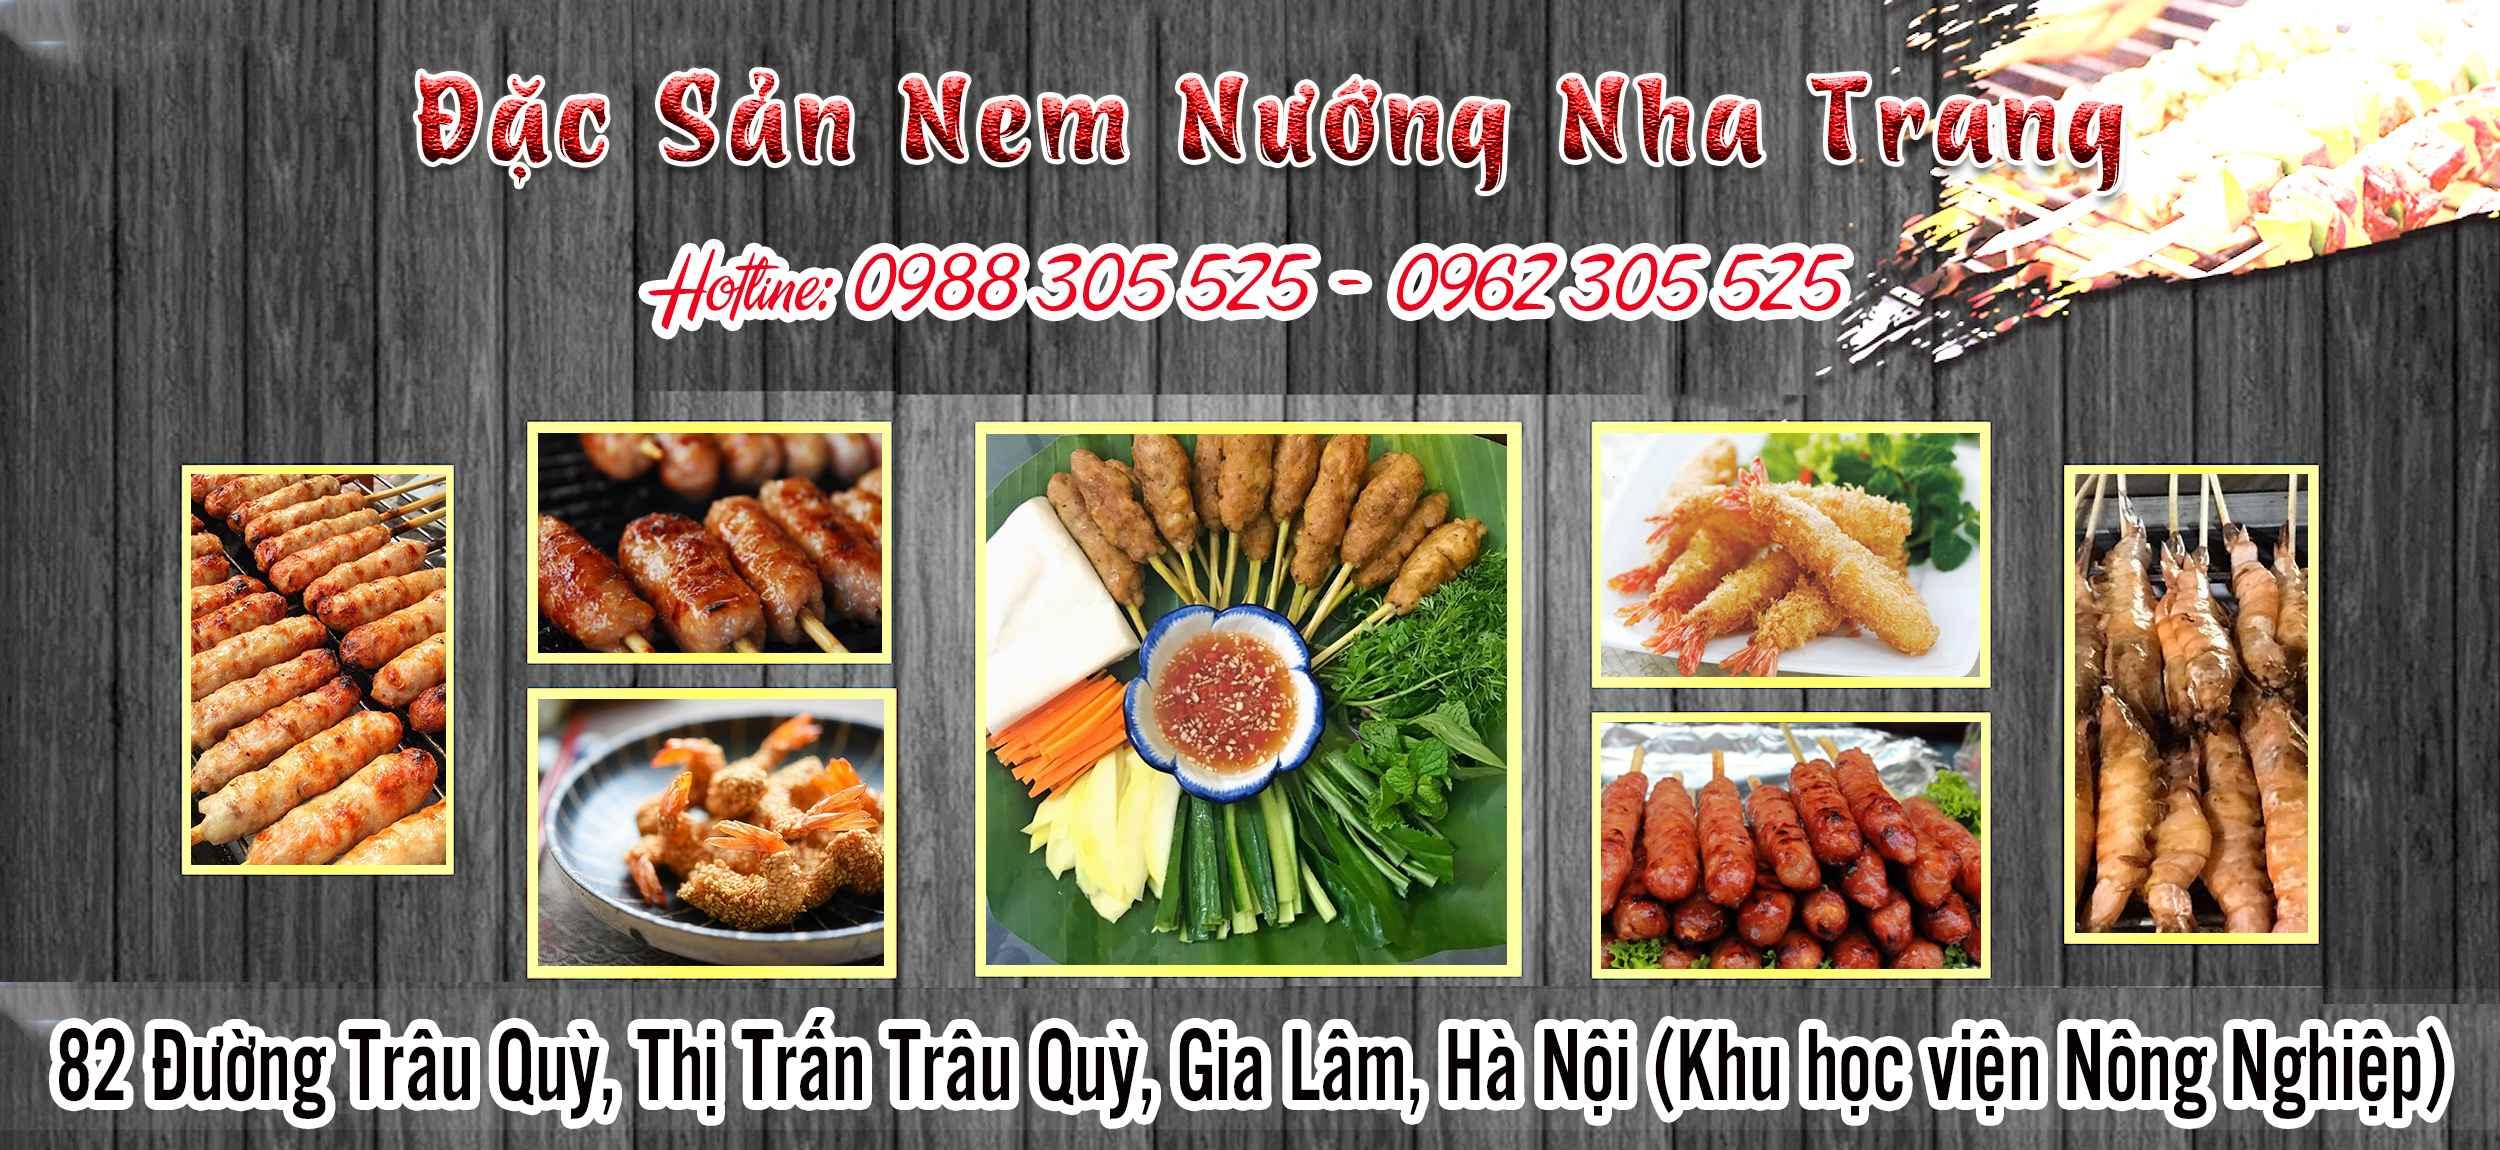 banner-dac-san-nem-nuong-nha-trang